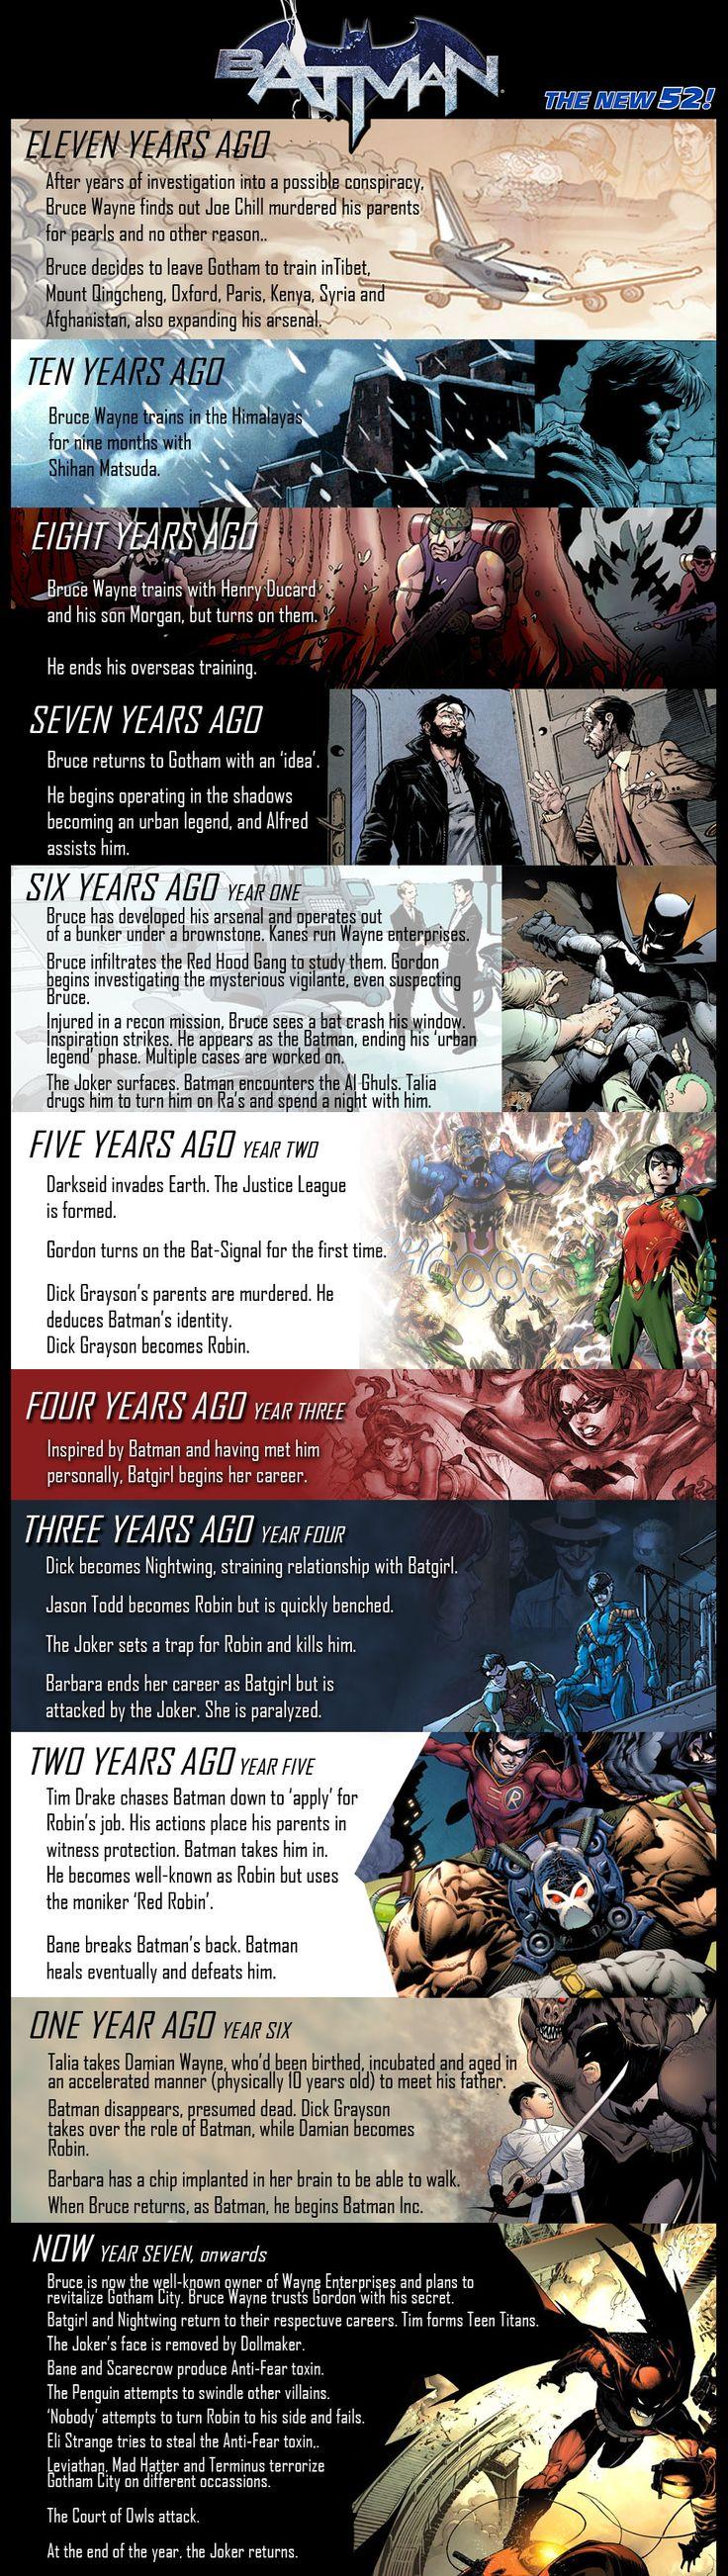 History of Batman